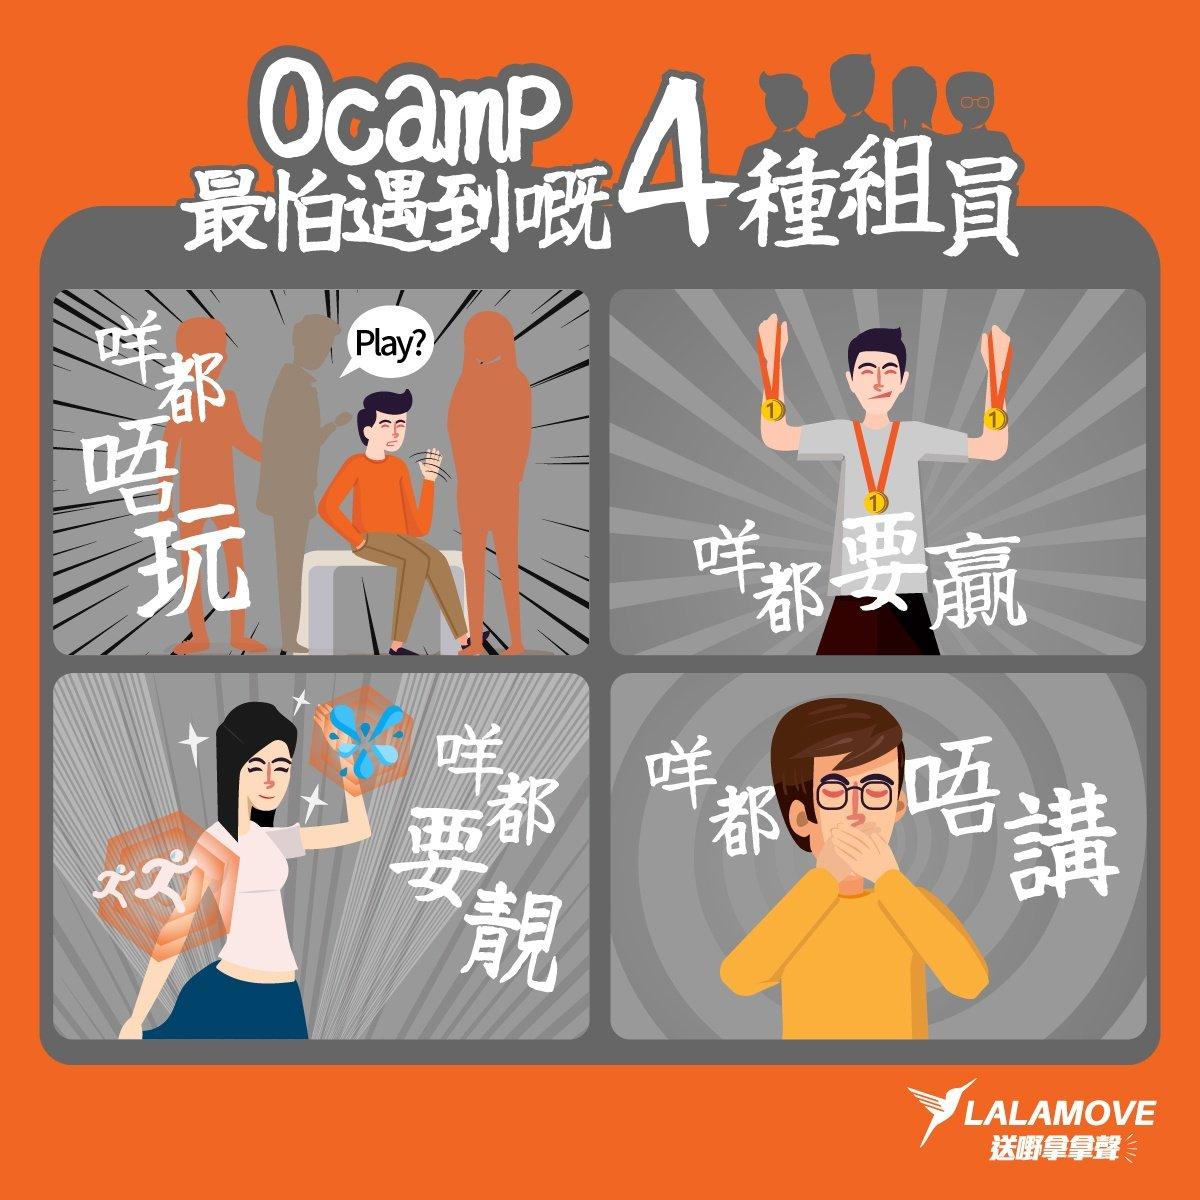 HK_OcampPeople_2018-01